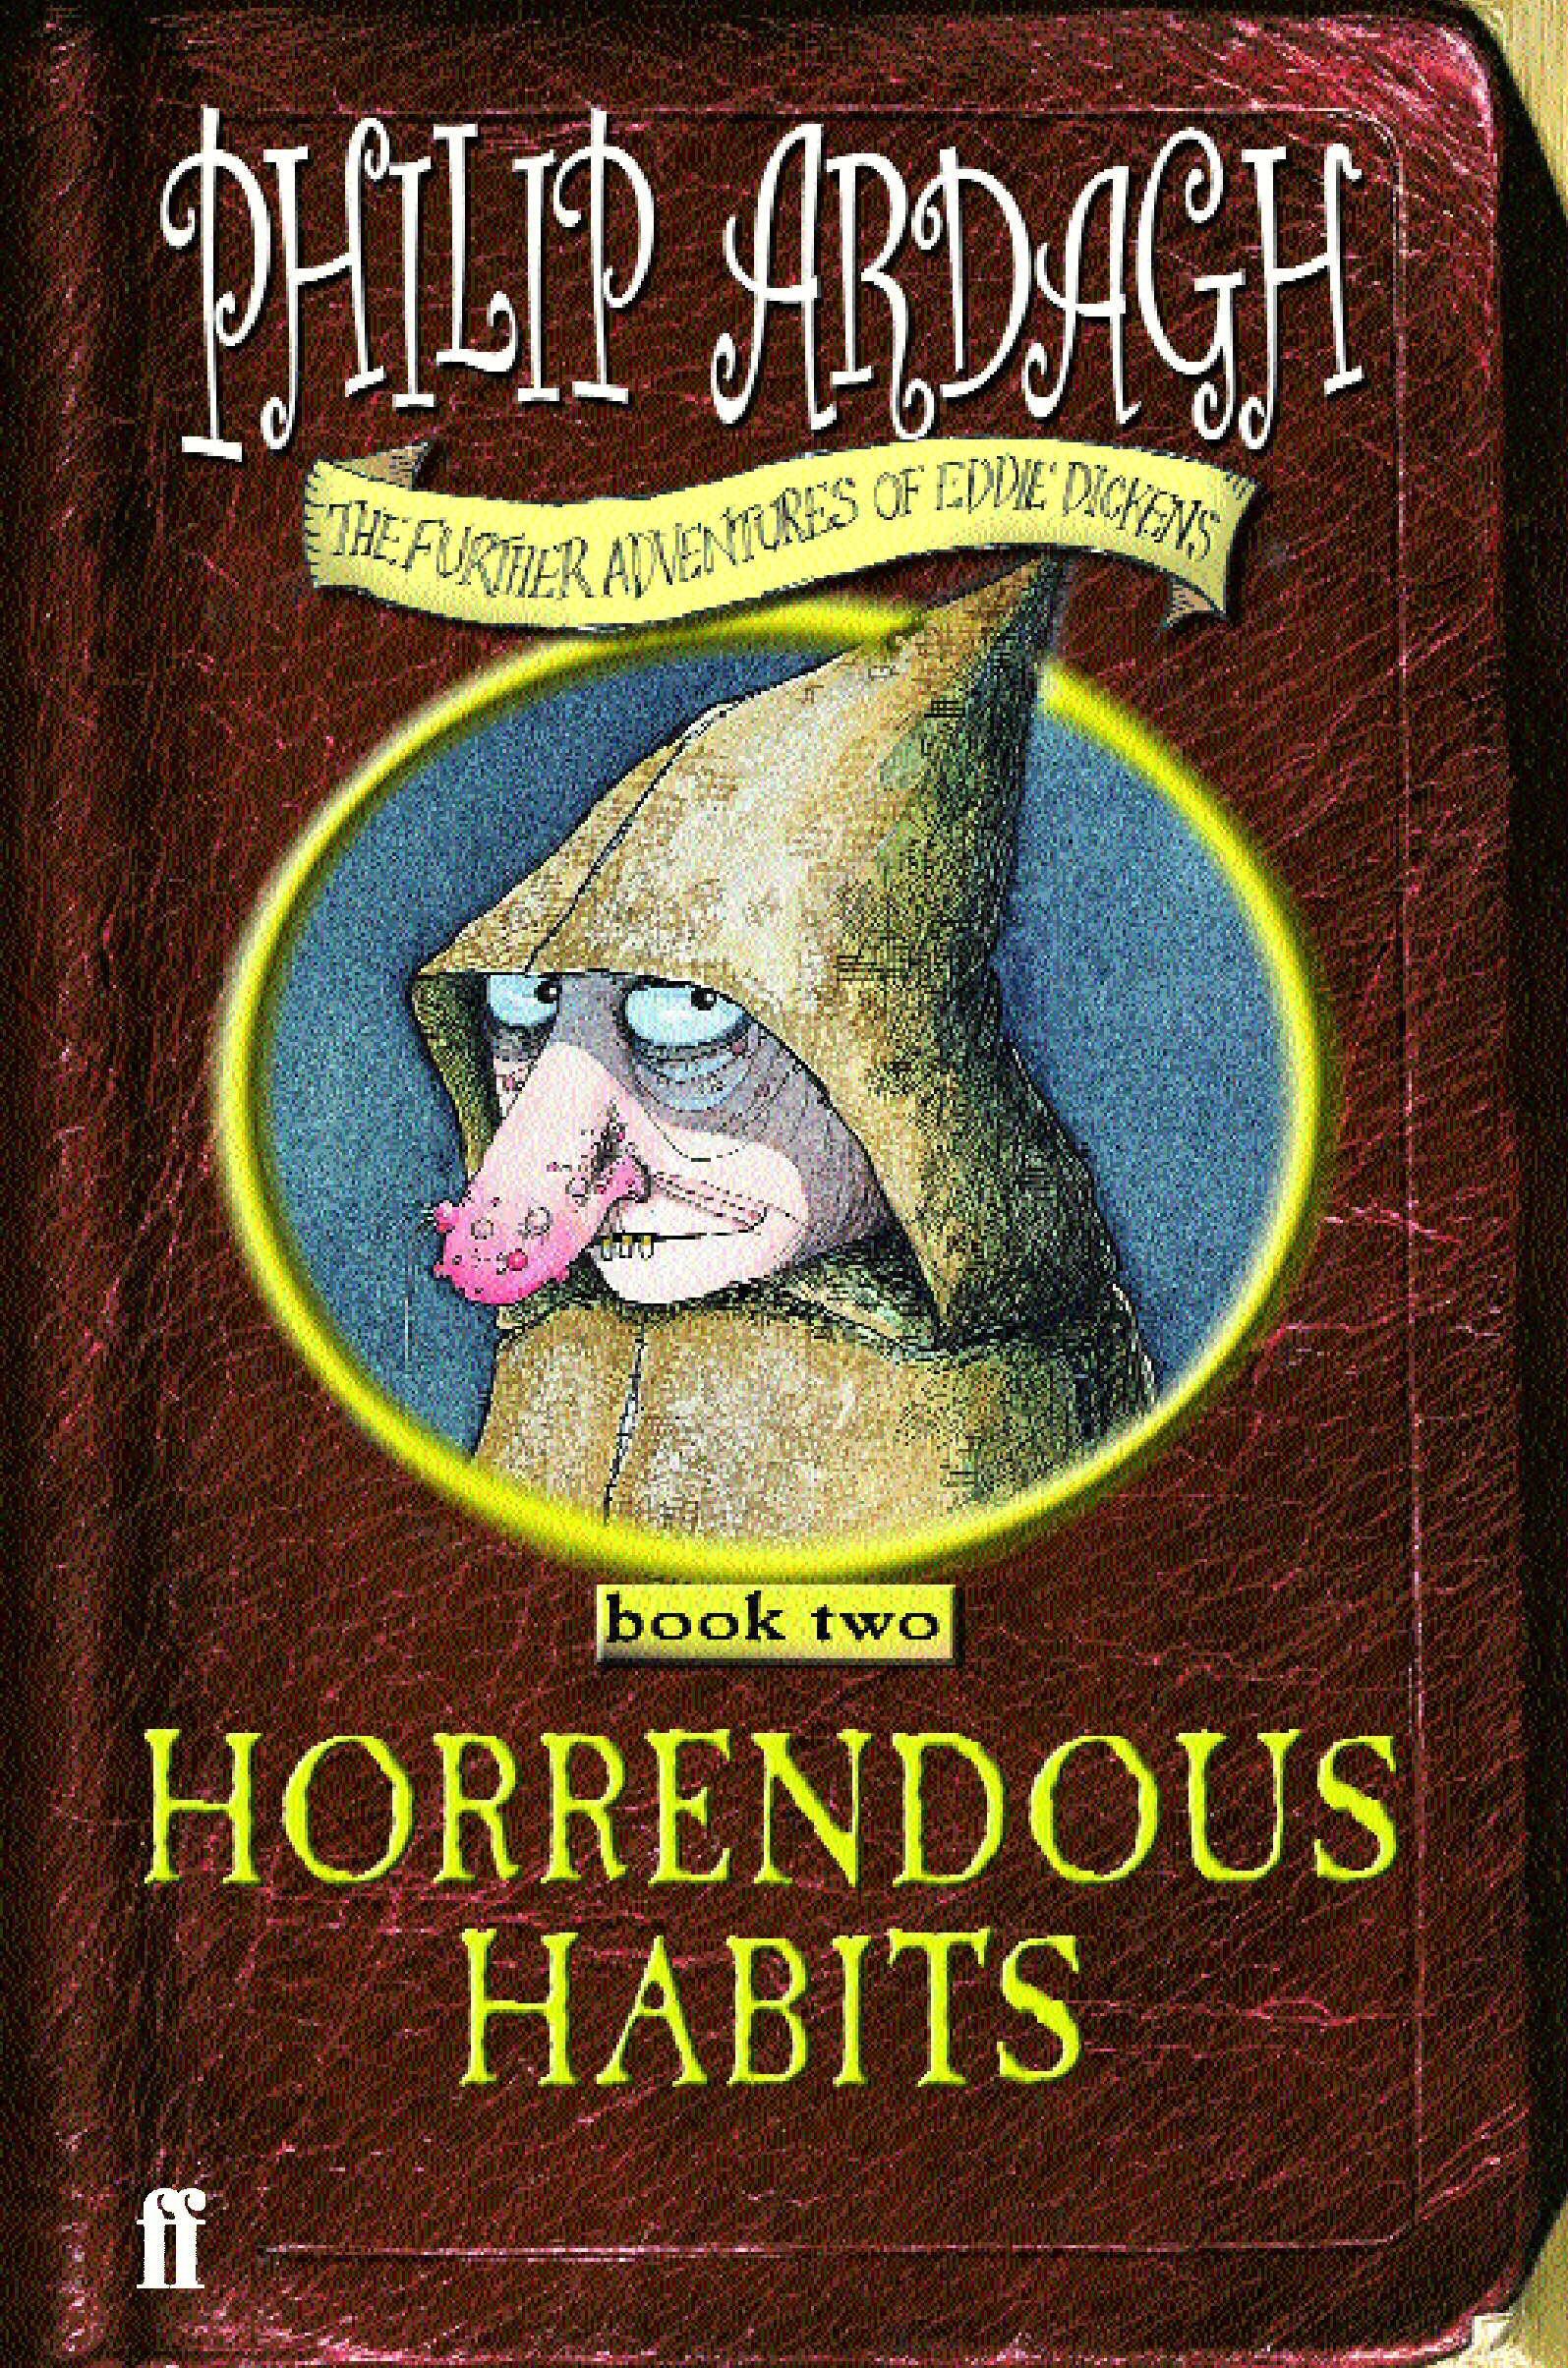 Download Horrendous Habits (Further Adventures of Eddie Dickens, Book 2) PDF